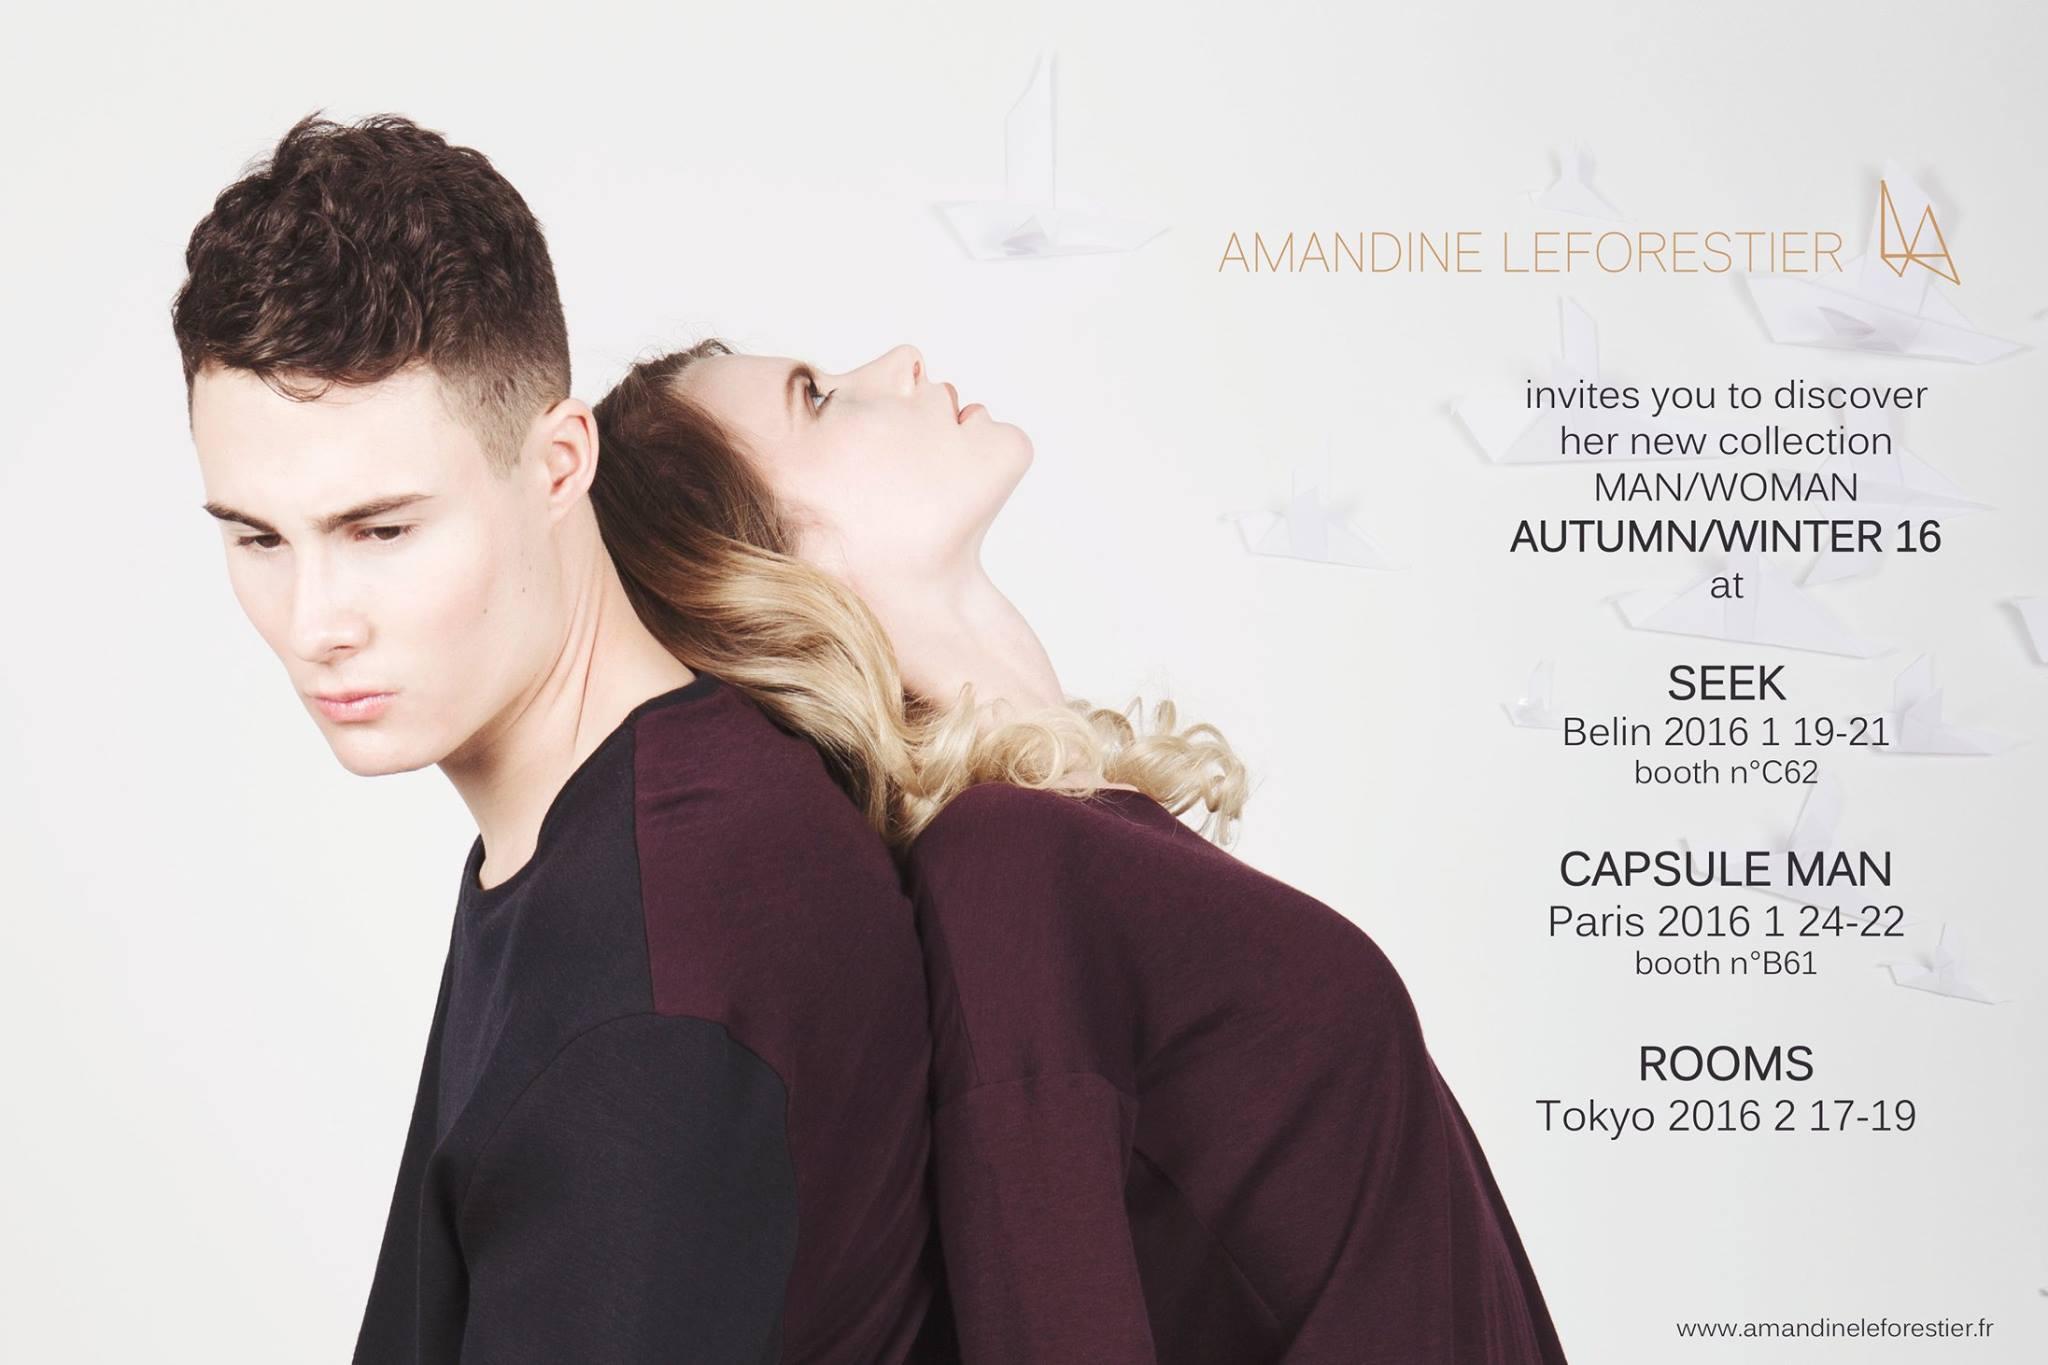 @Amandine Leforestier